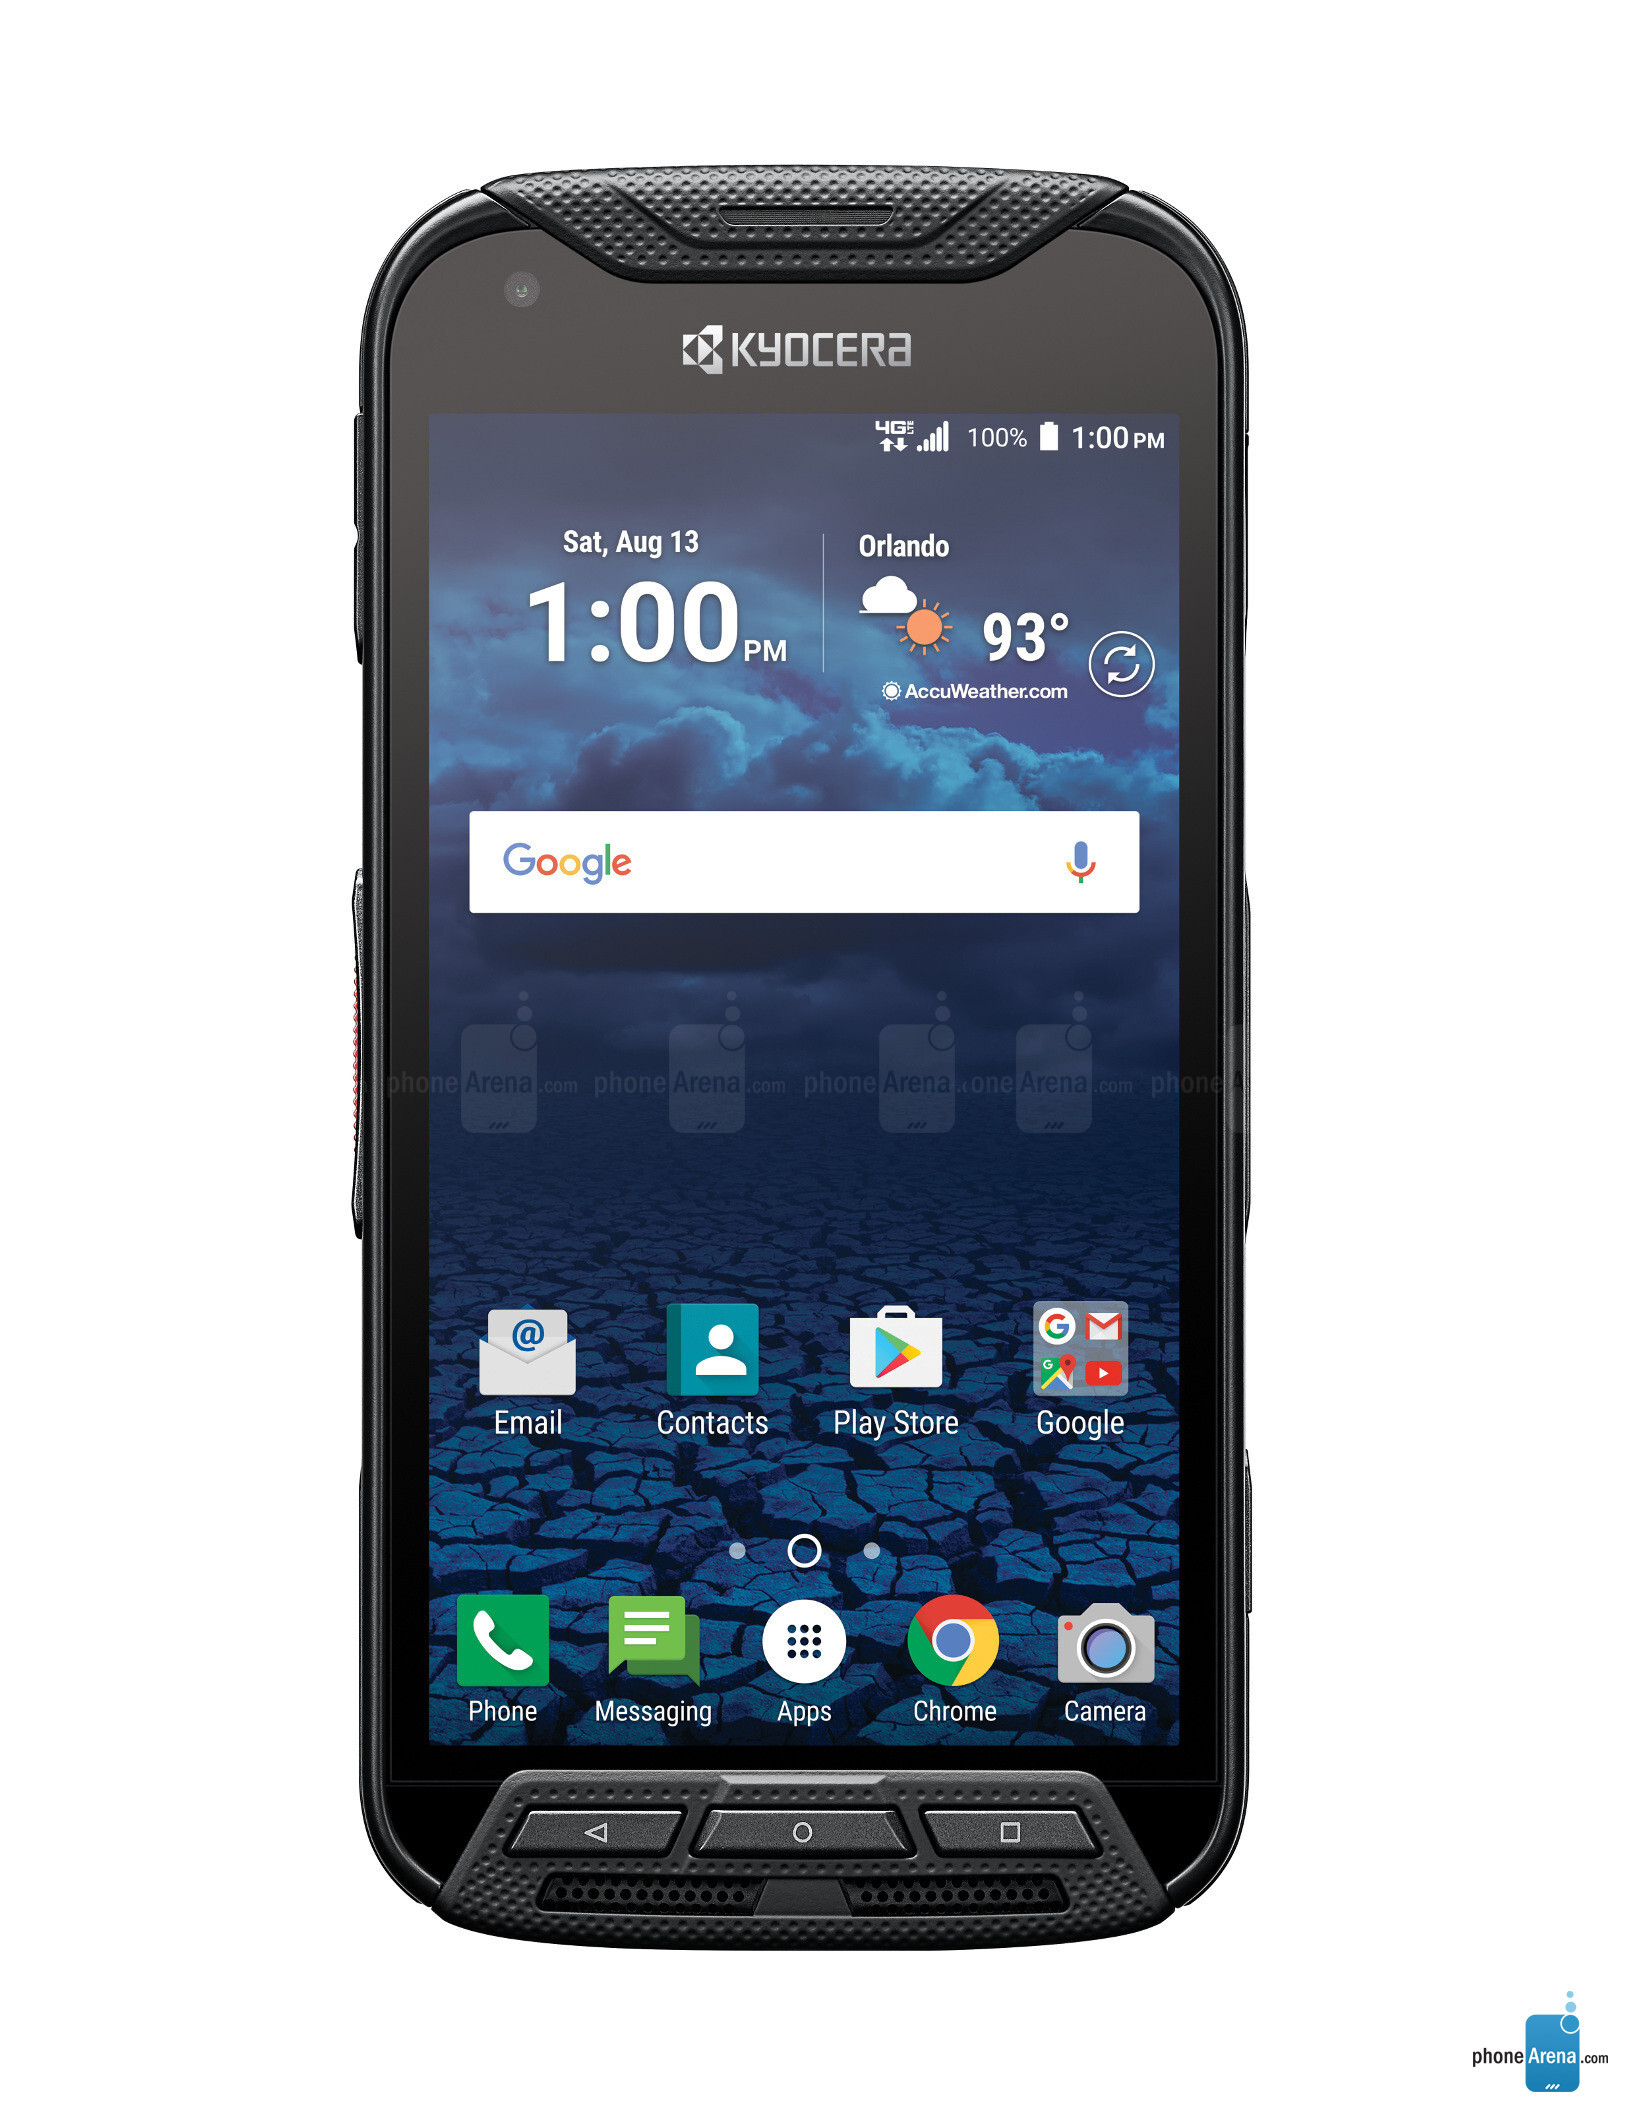 Kyocera Duraforce Pro Specs